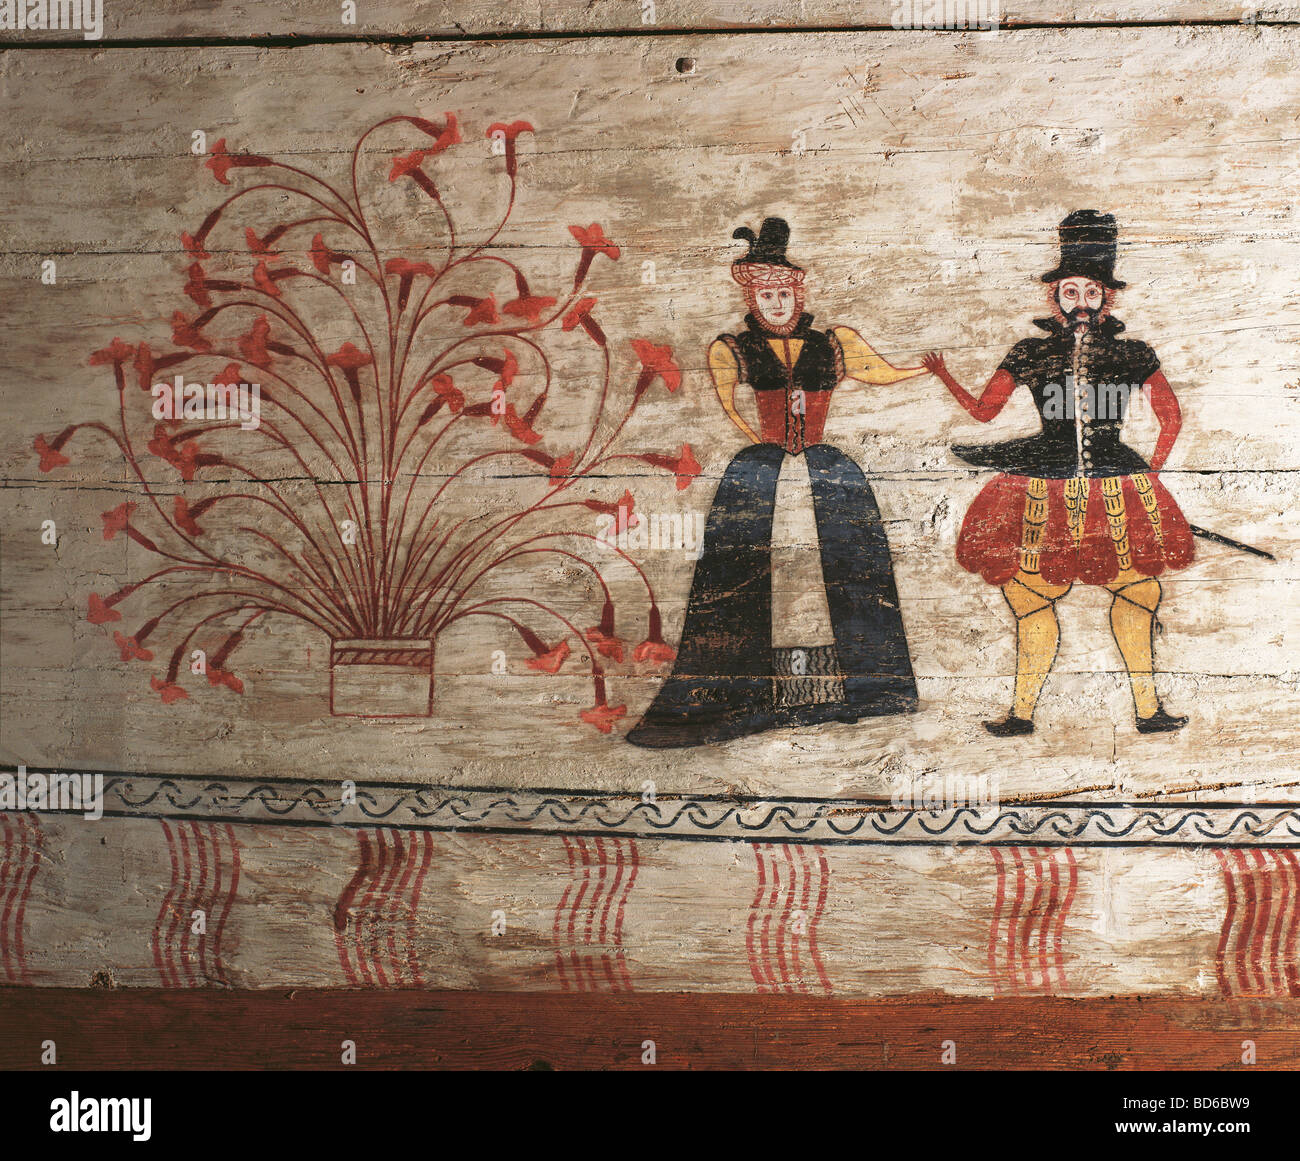 fine arts, folk art, Germany, painting, barn dance, corn box from Moosen, Upper Bavaria, circa 1575, Glentleiten - Stock Image